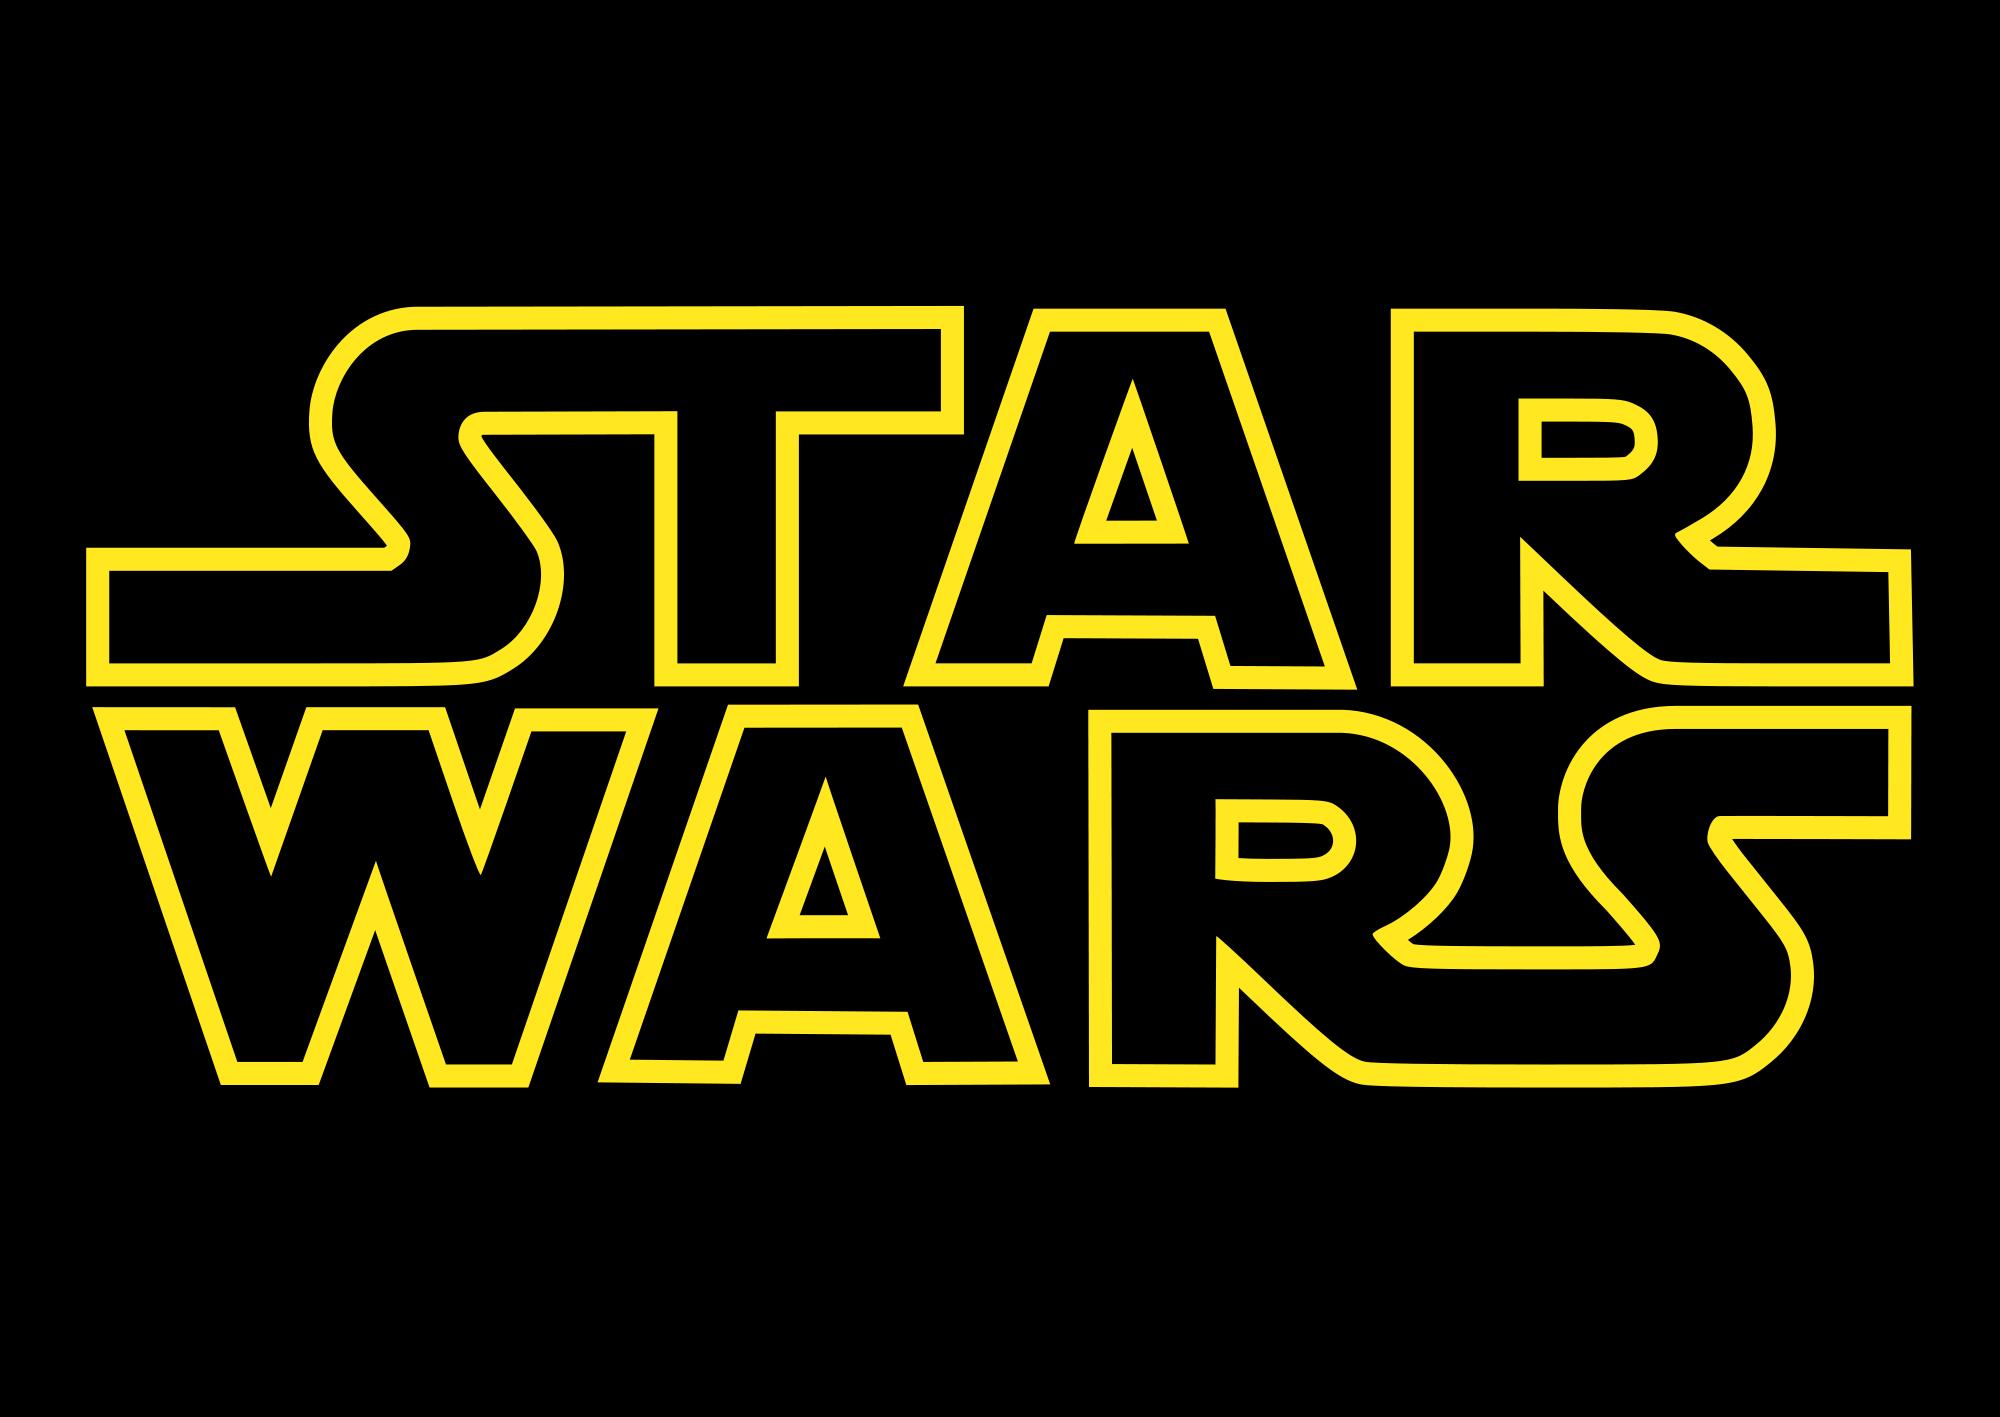 Posibilidades de una serie de TV de Star Wars disminuyen